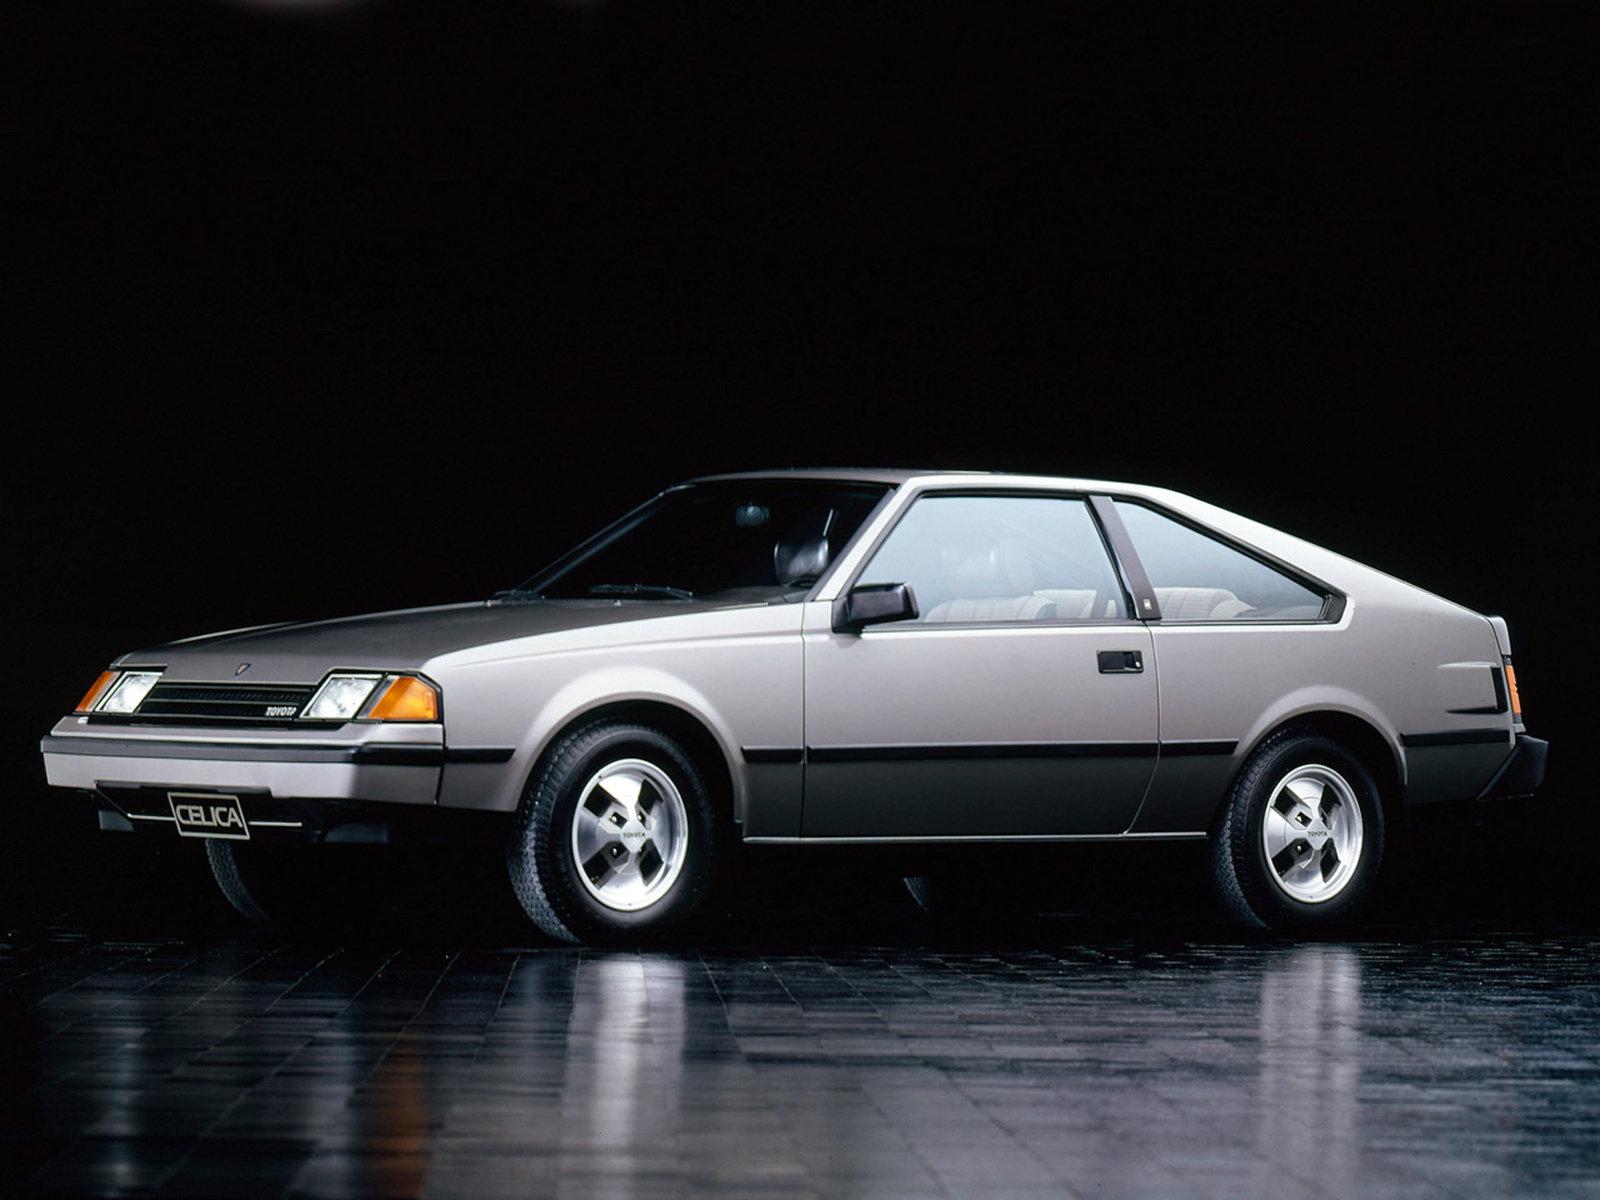 Toyota (Тойота) Celica Liftback 1983-1985 г.